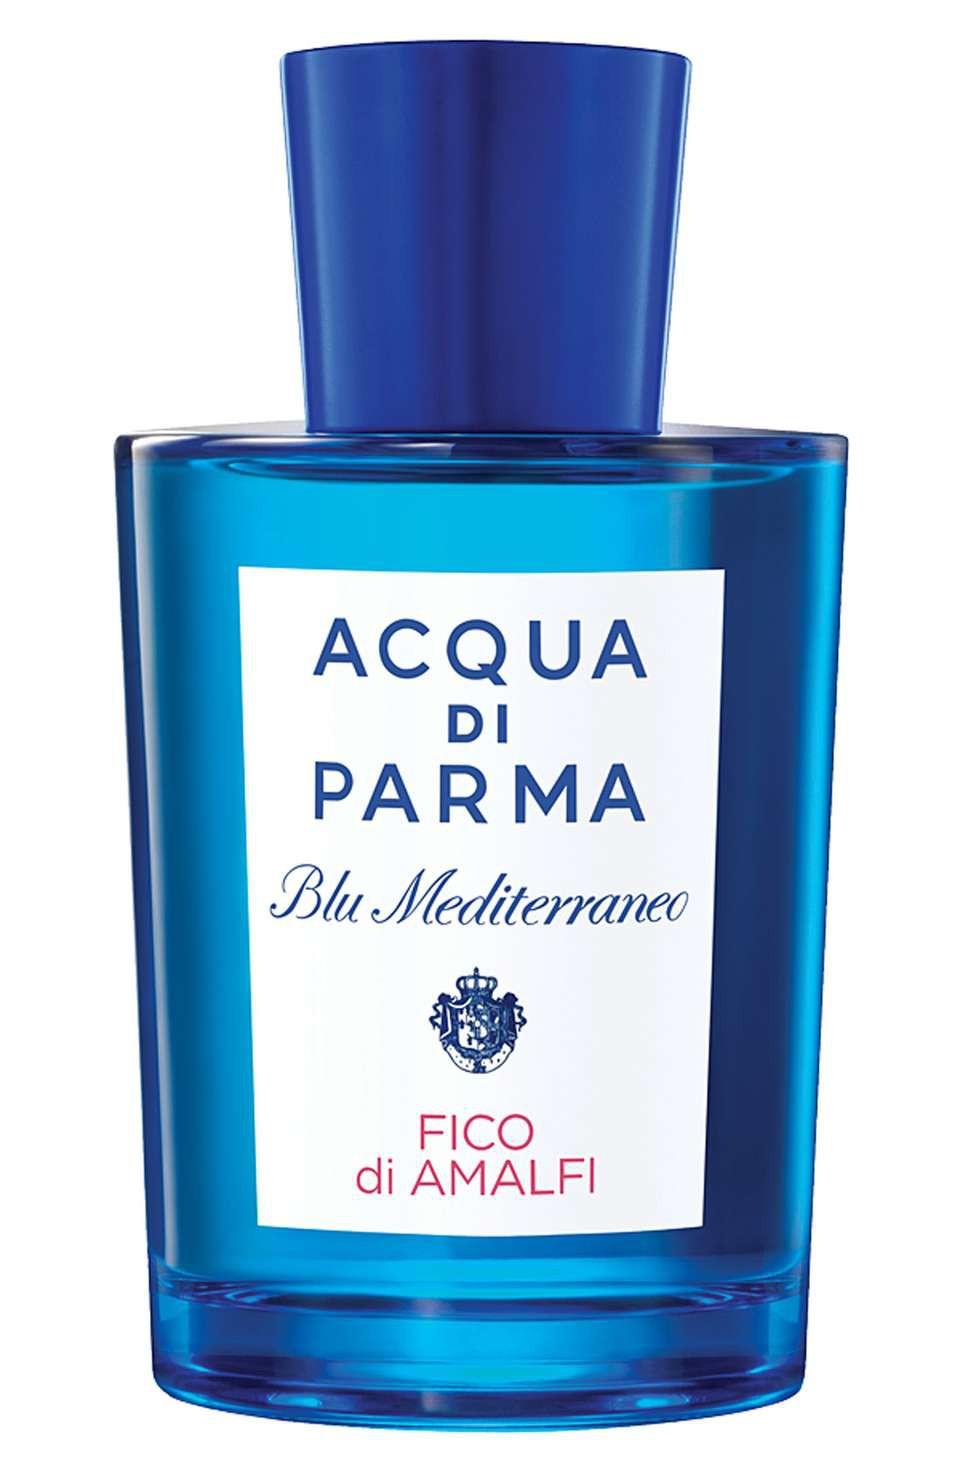 Acqua di Parma Blu Mediterraneo Fico Di Amalfi аромат для мужчин и женщин